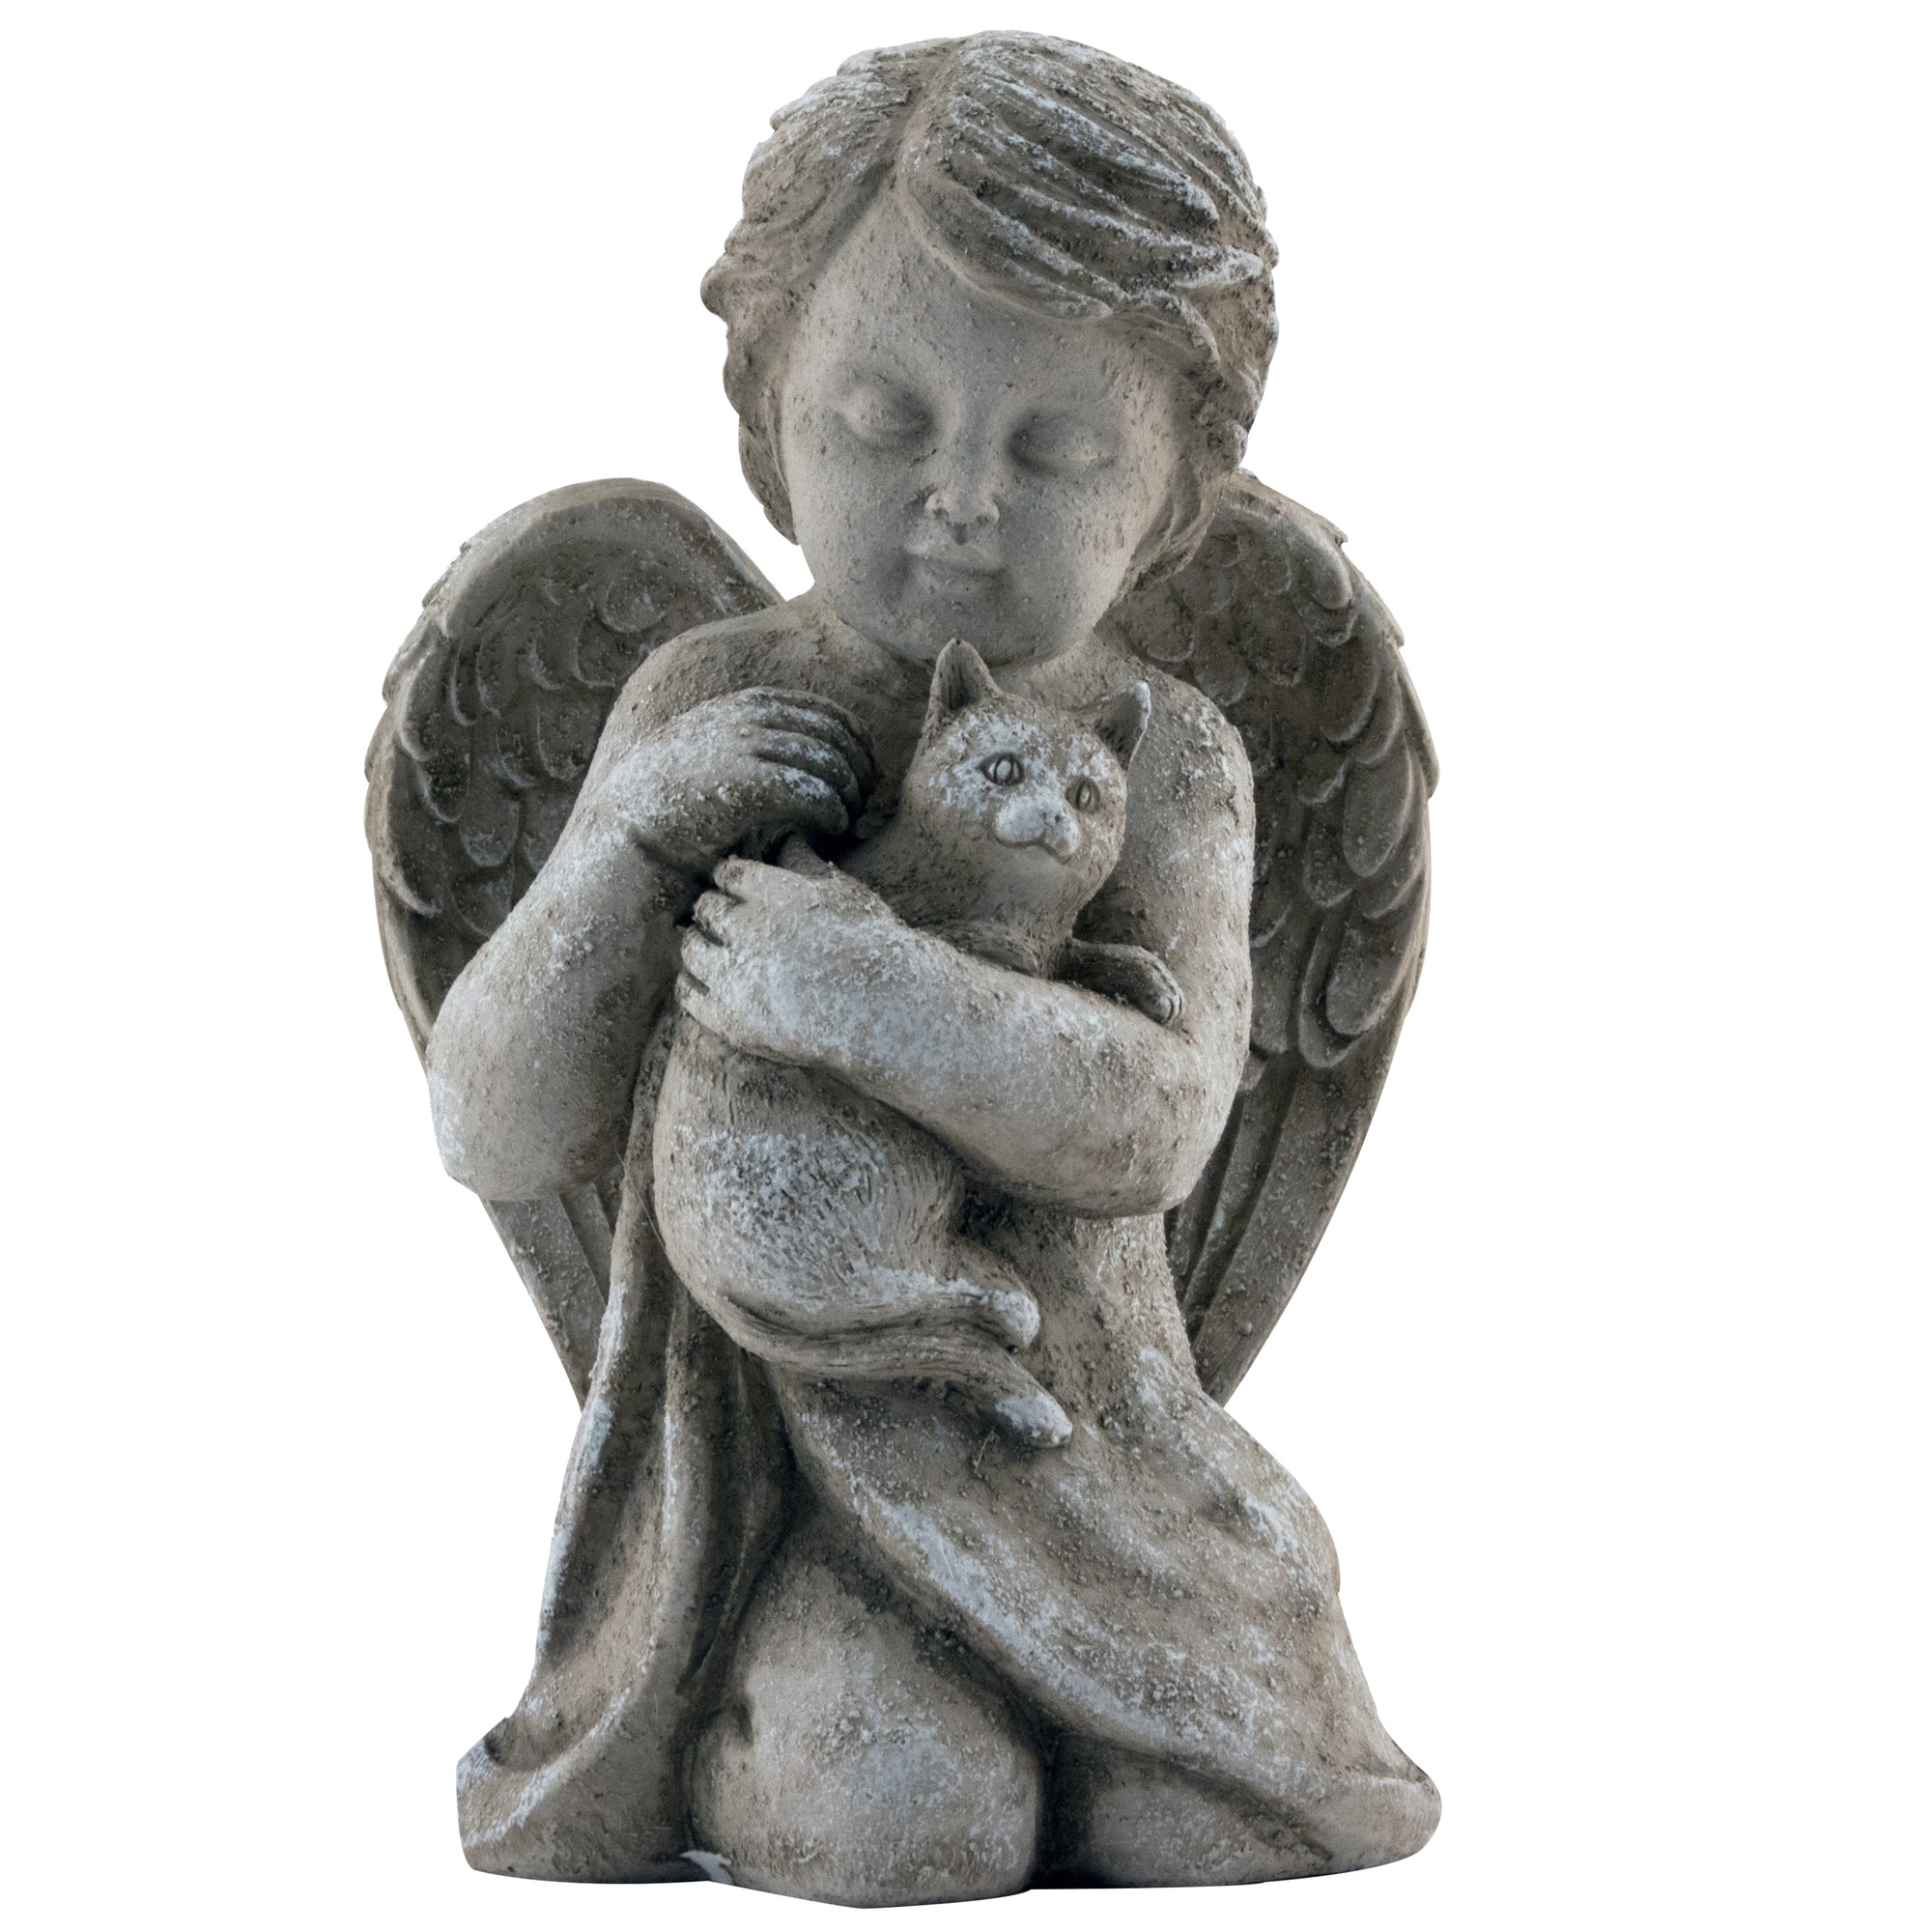 in the statues statue international usa campania pin stone cat made cheswick garden cast